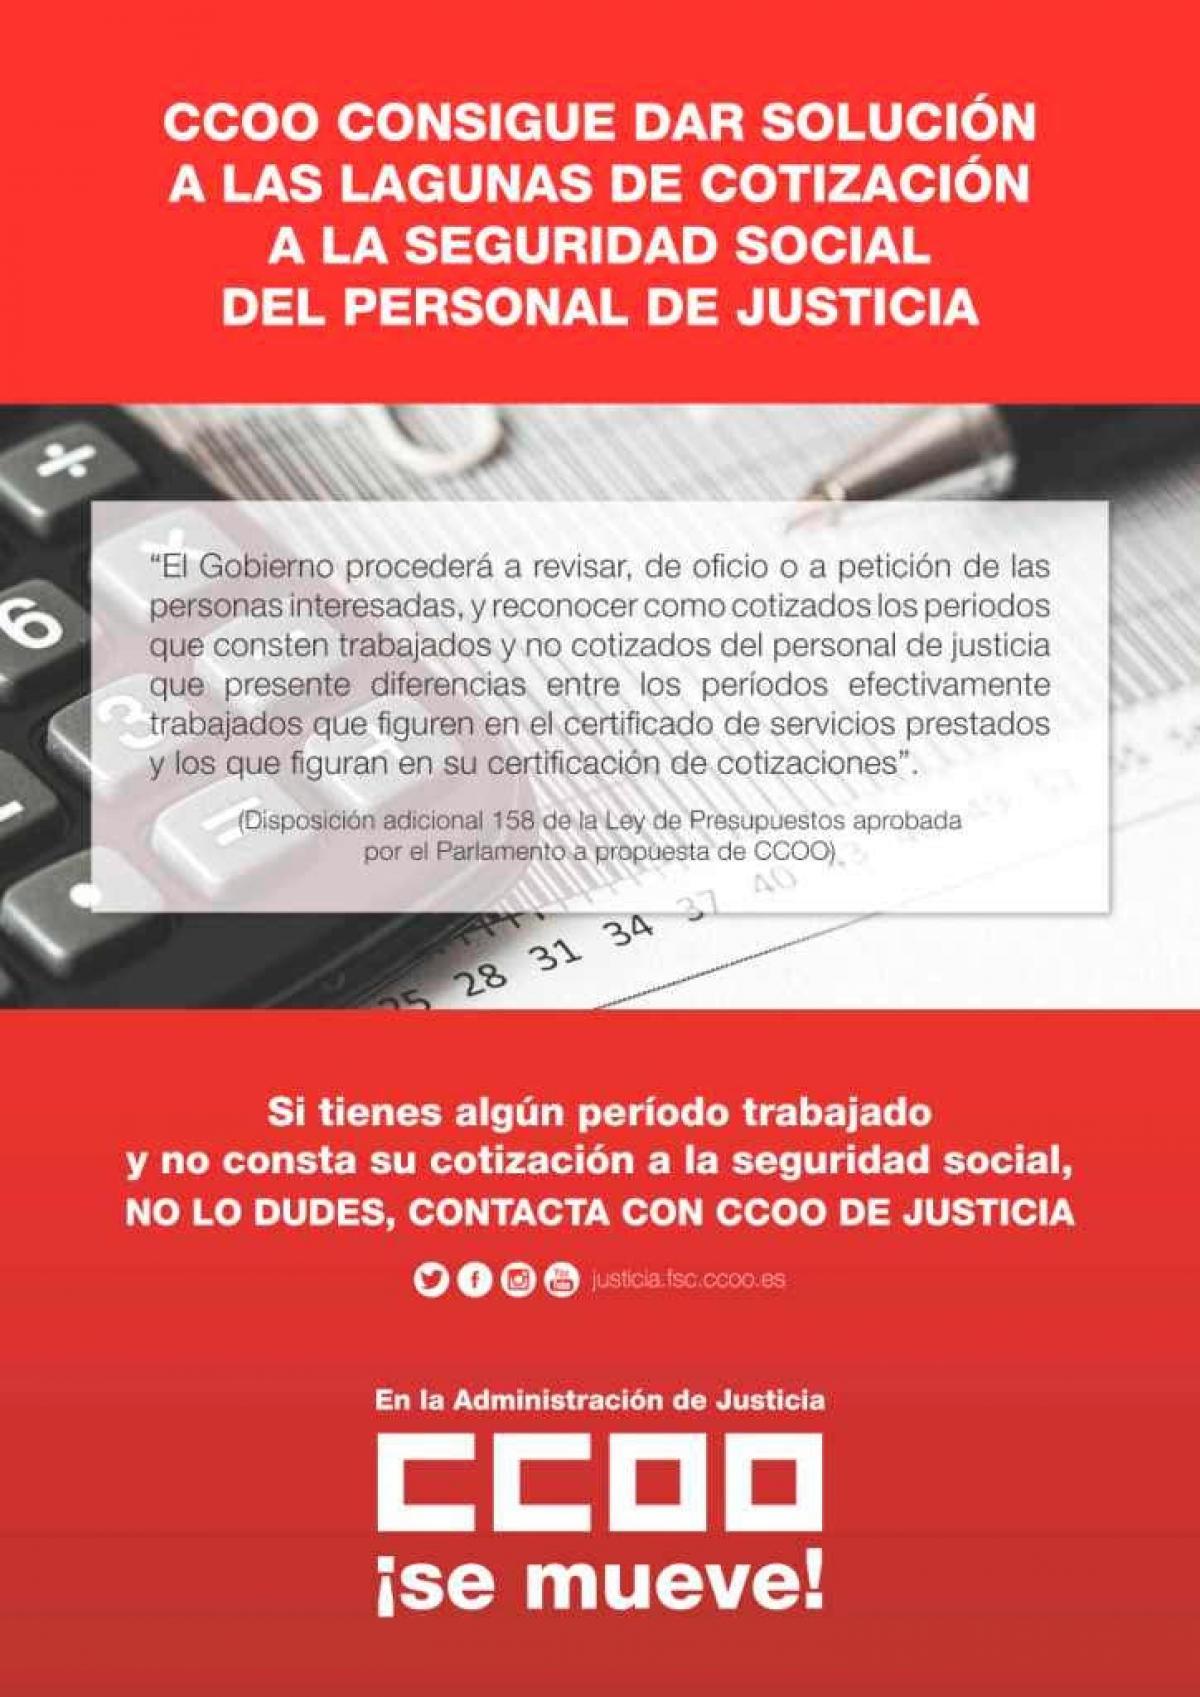 https://justicia.fsc.ccoo.es/d46b23d771344bb157159e0b88f4822e000050.jpg